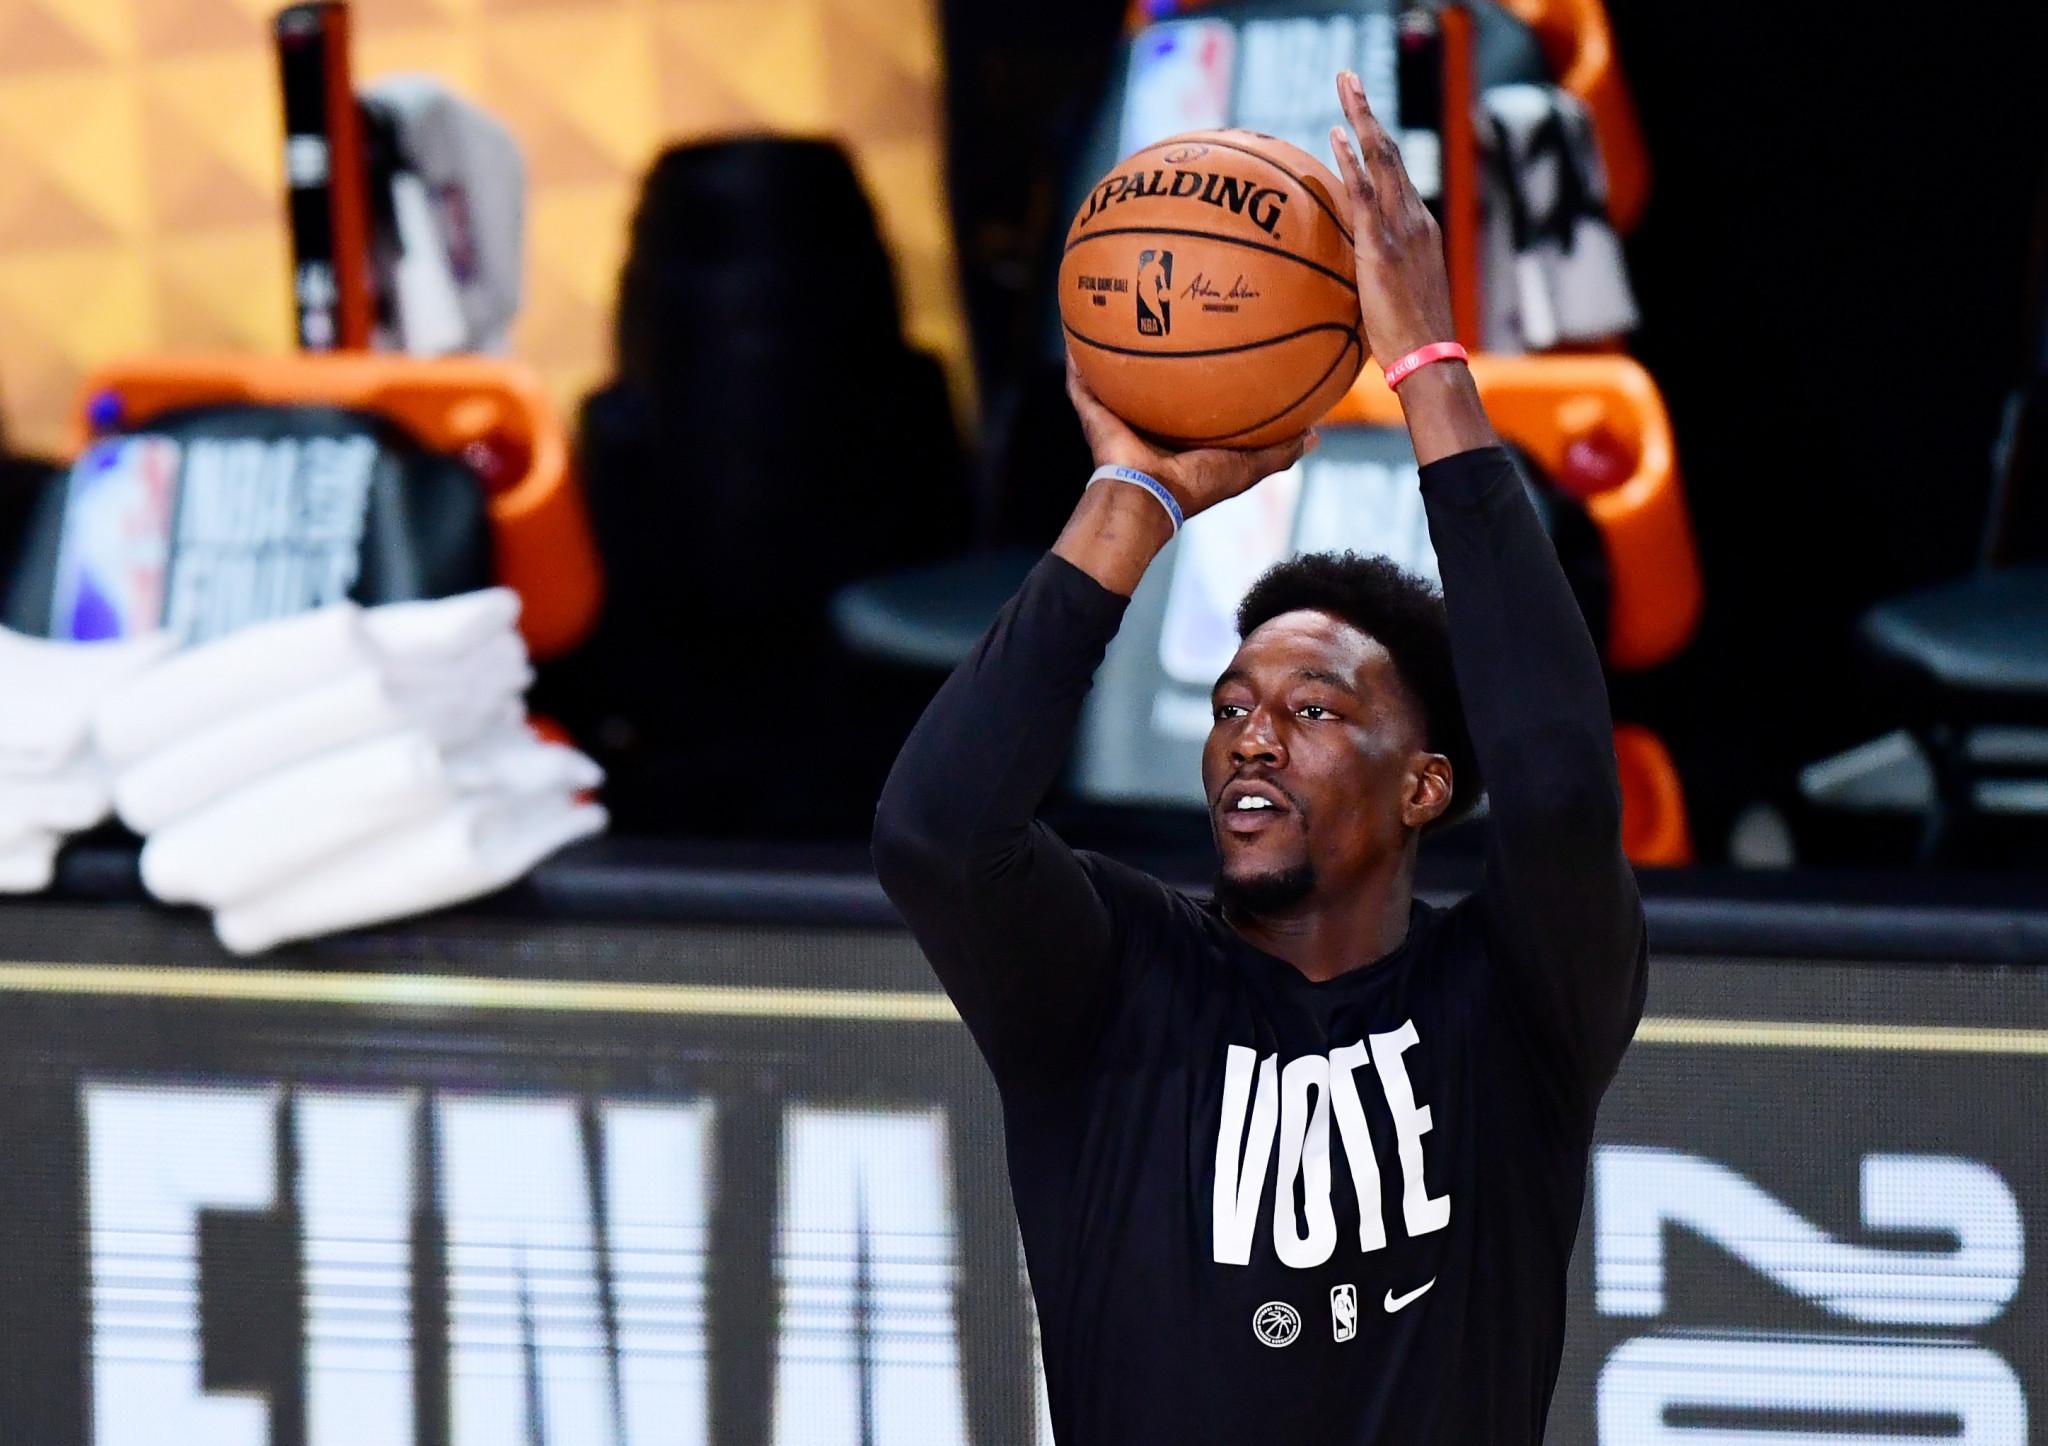 NBA rising star Adebayo eligible to represent Nigeria at Tokyo 2020